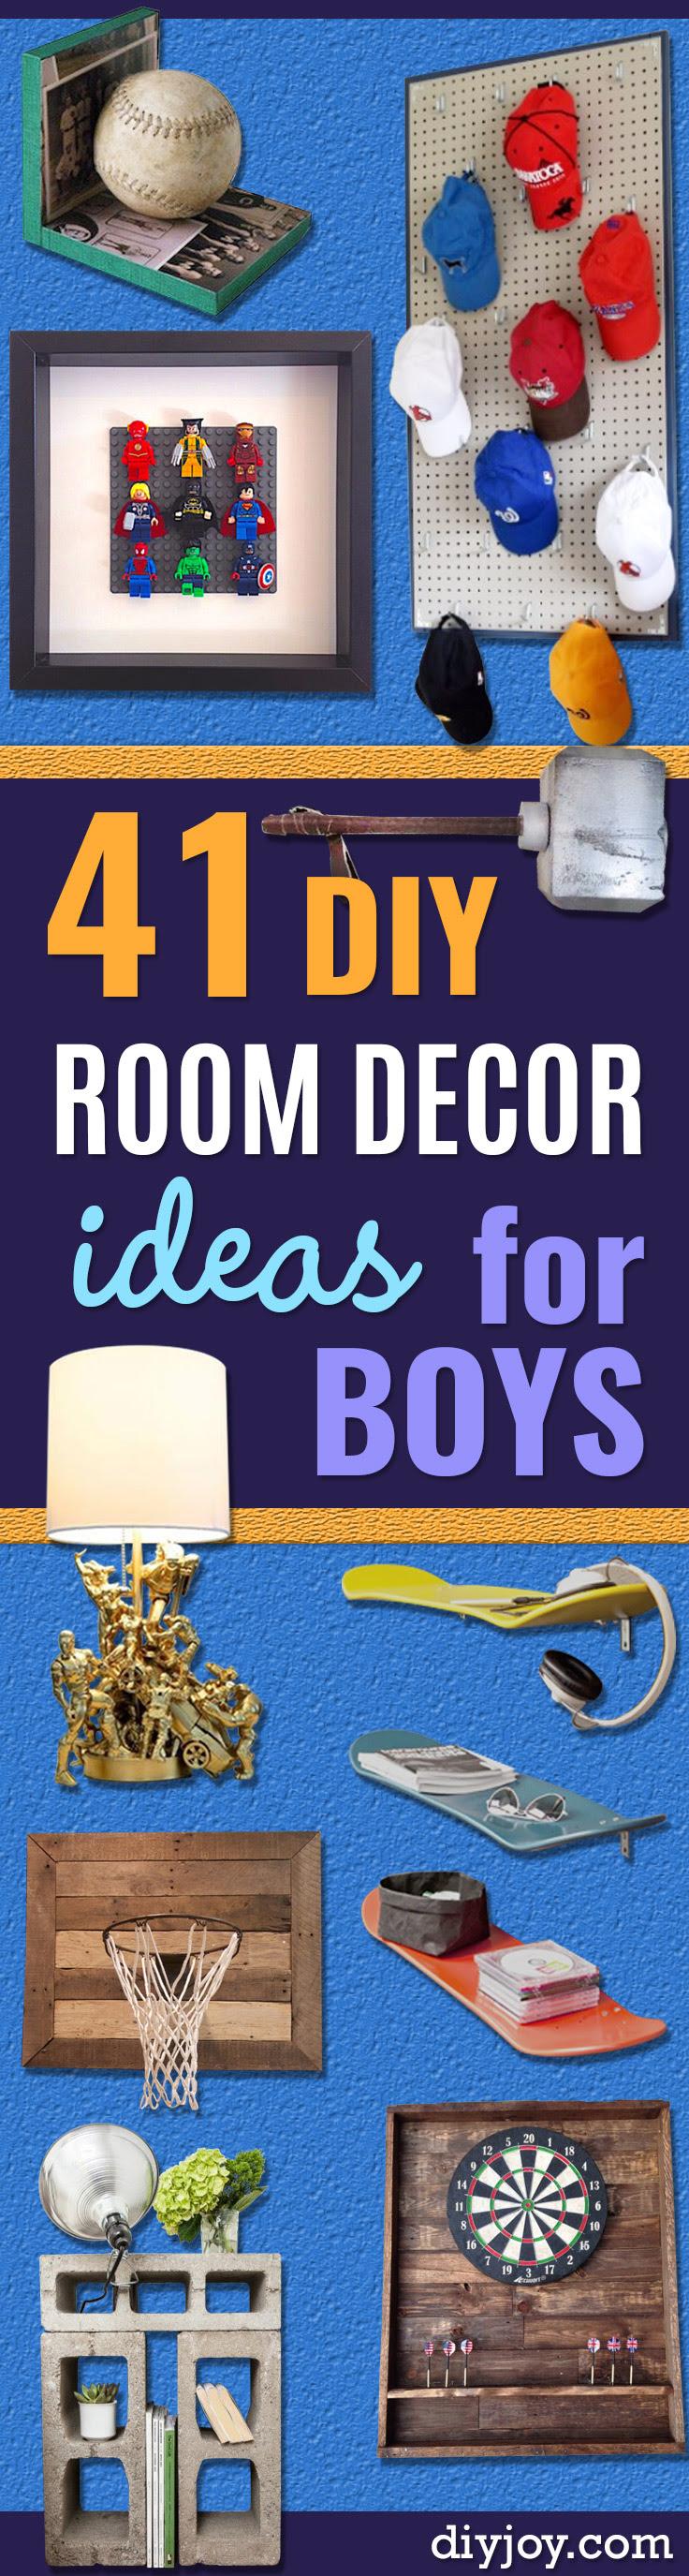 41 Super Creative DIY Room Decor Ideas for Boys